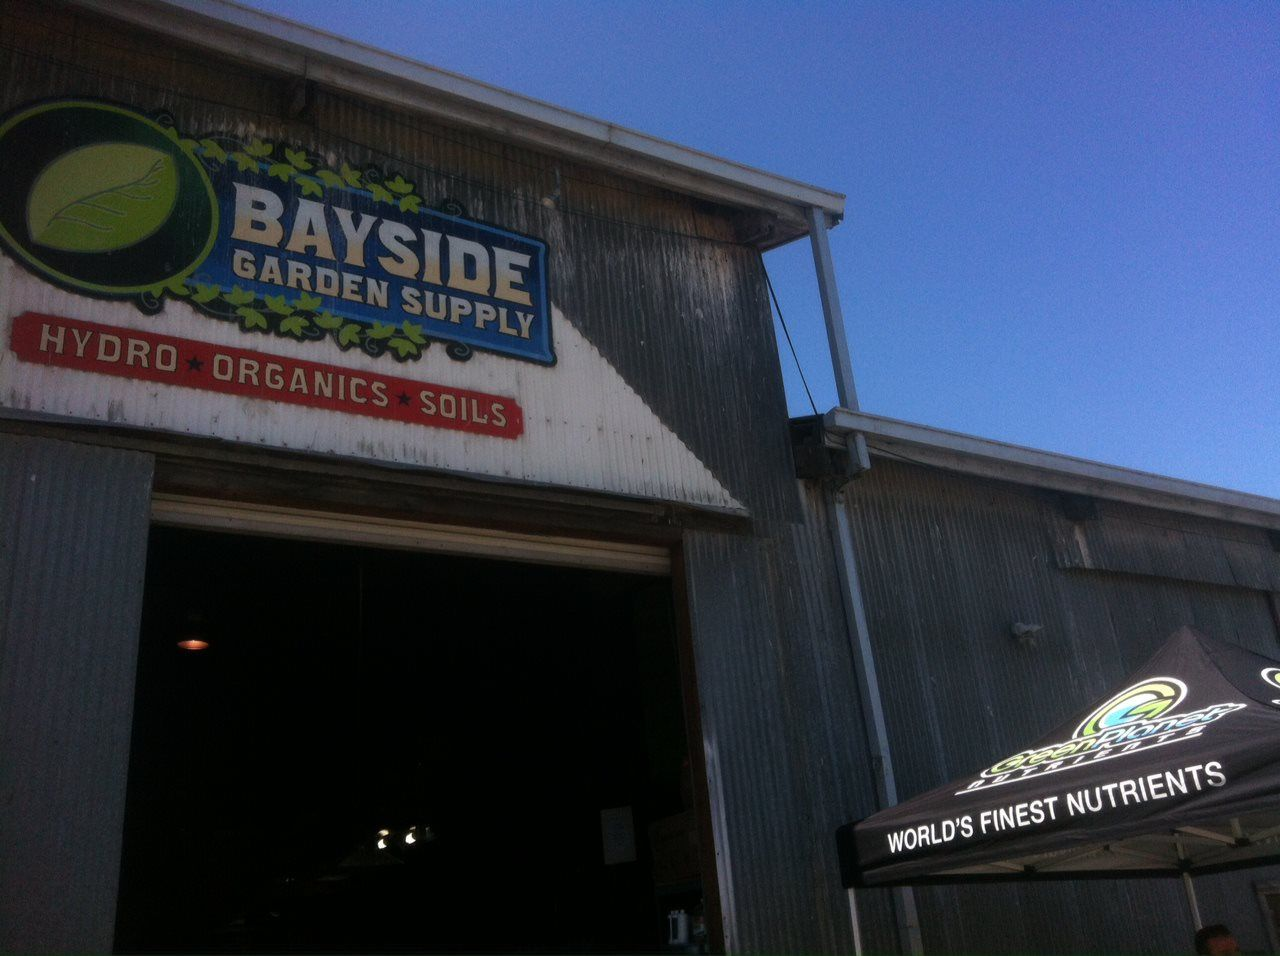 Bayside Garden Supply in Arcata, CA! Garden supplies